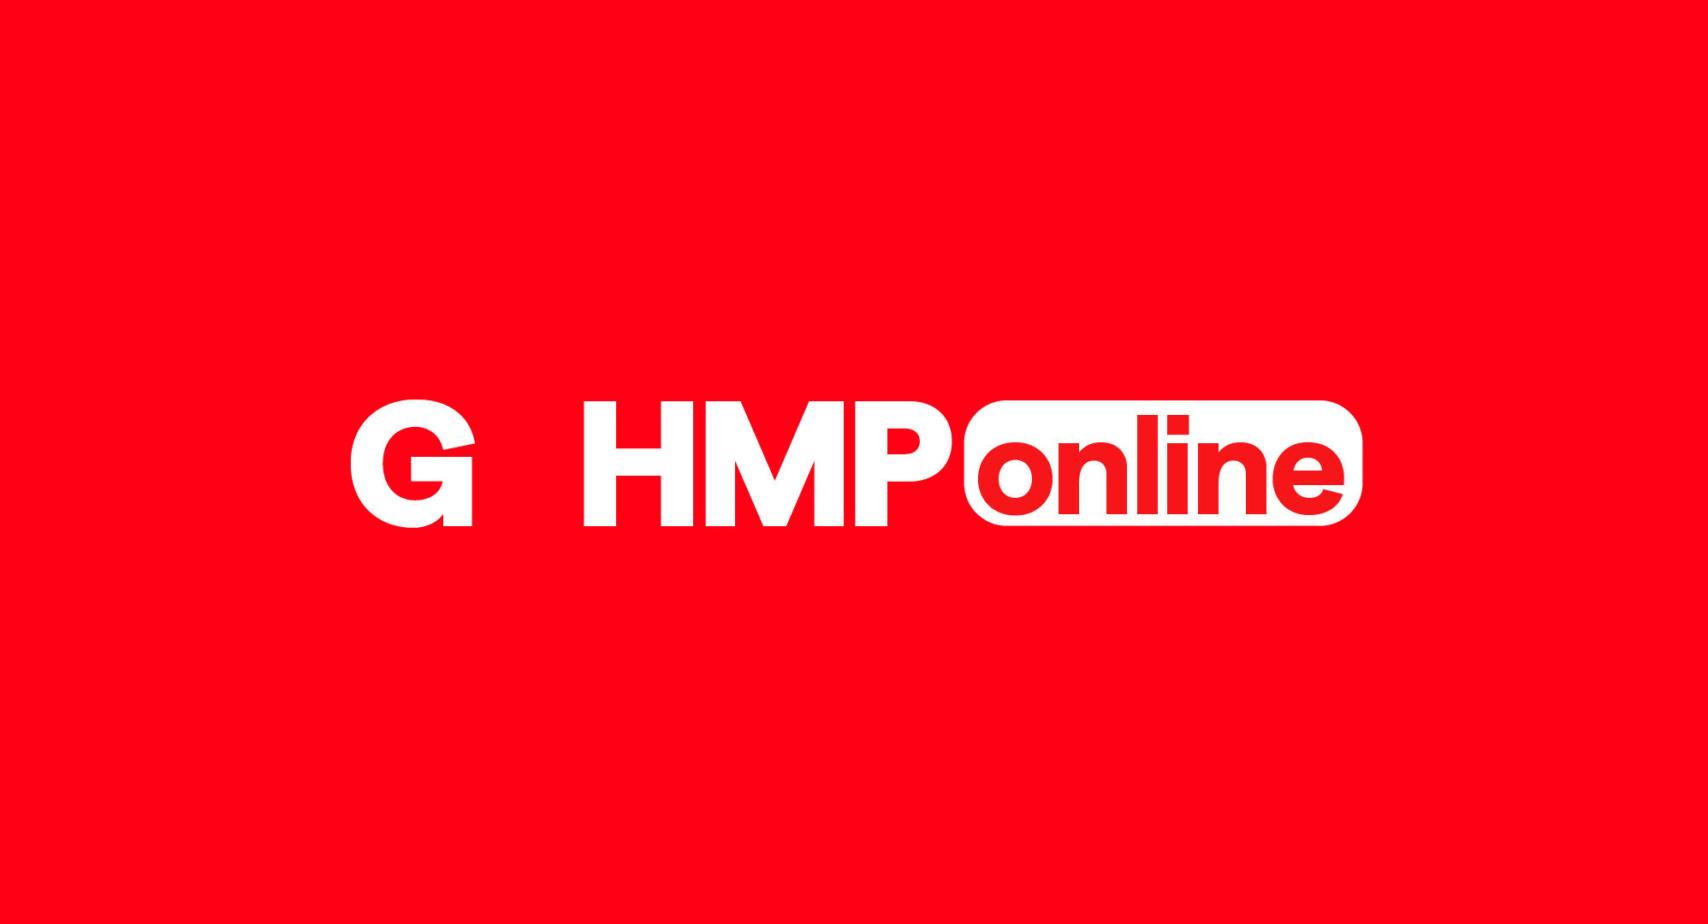 ghmp-online